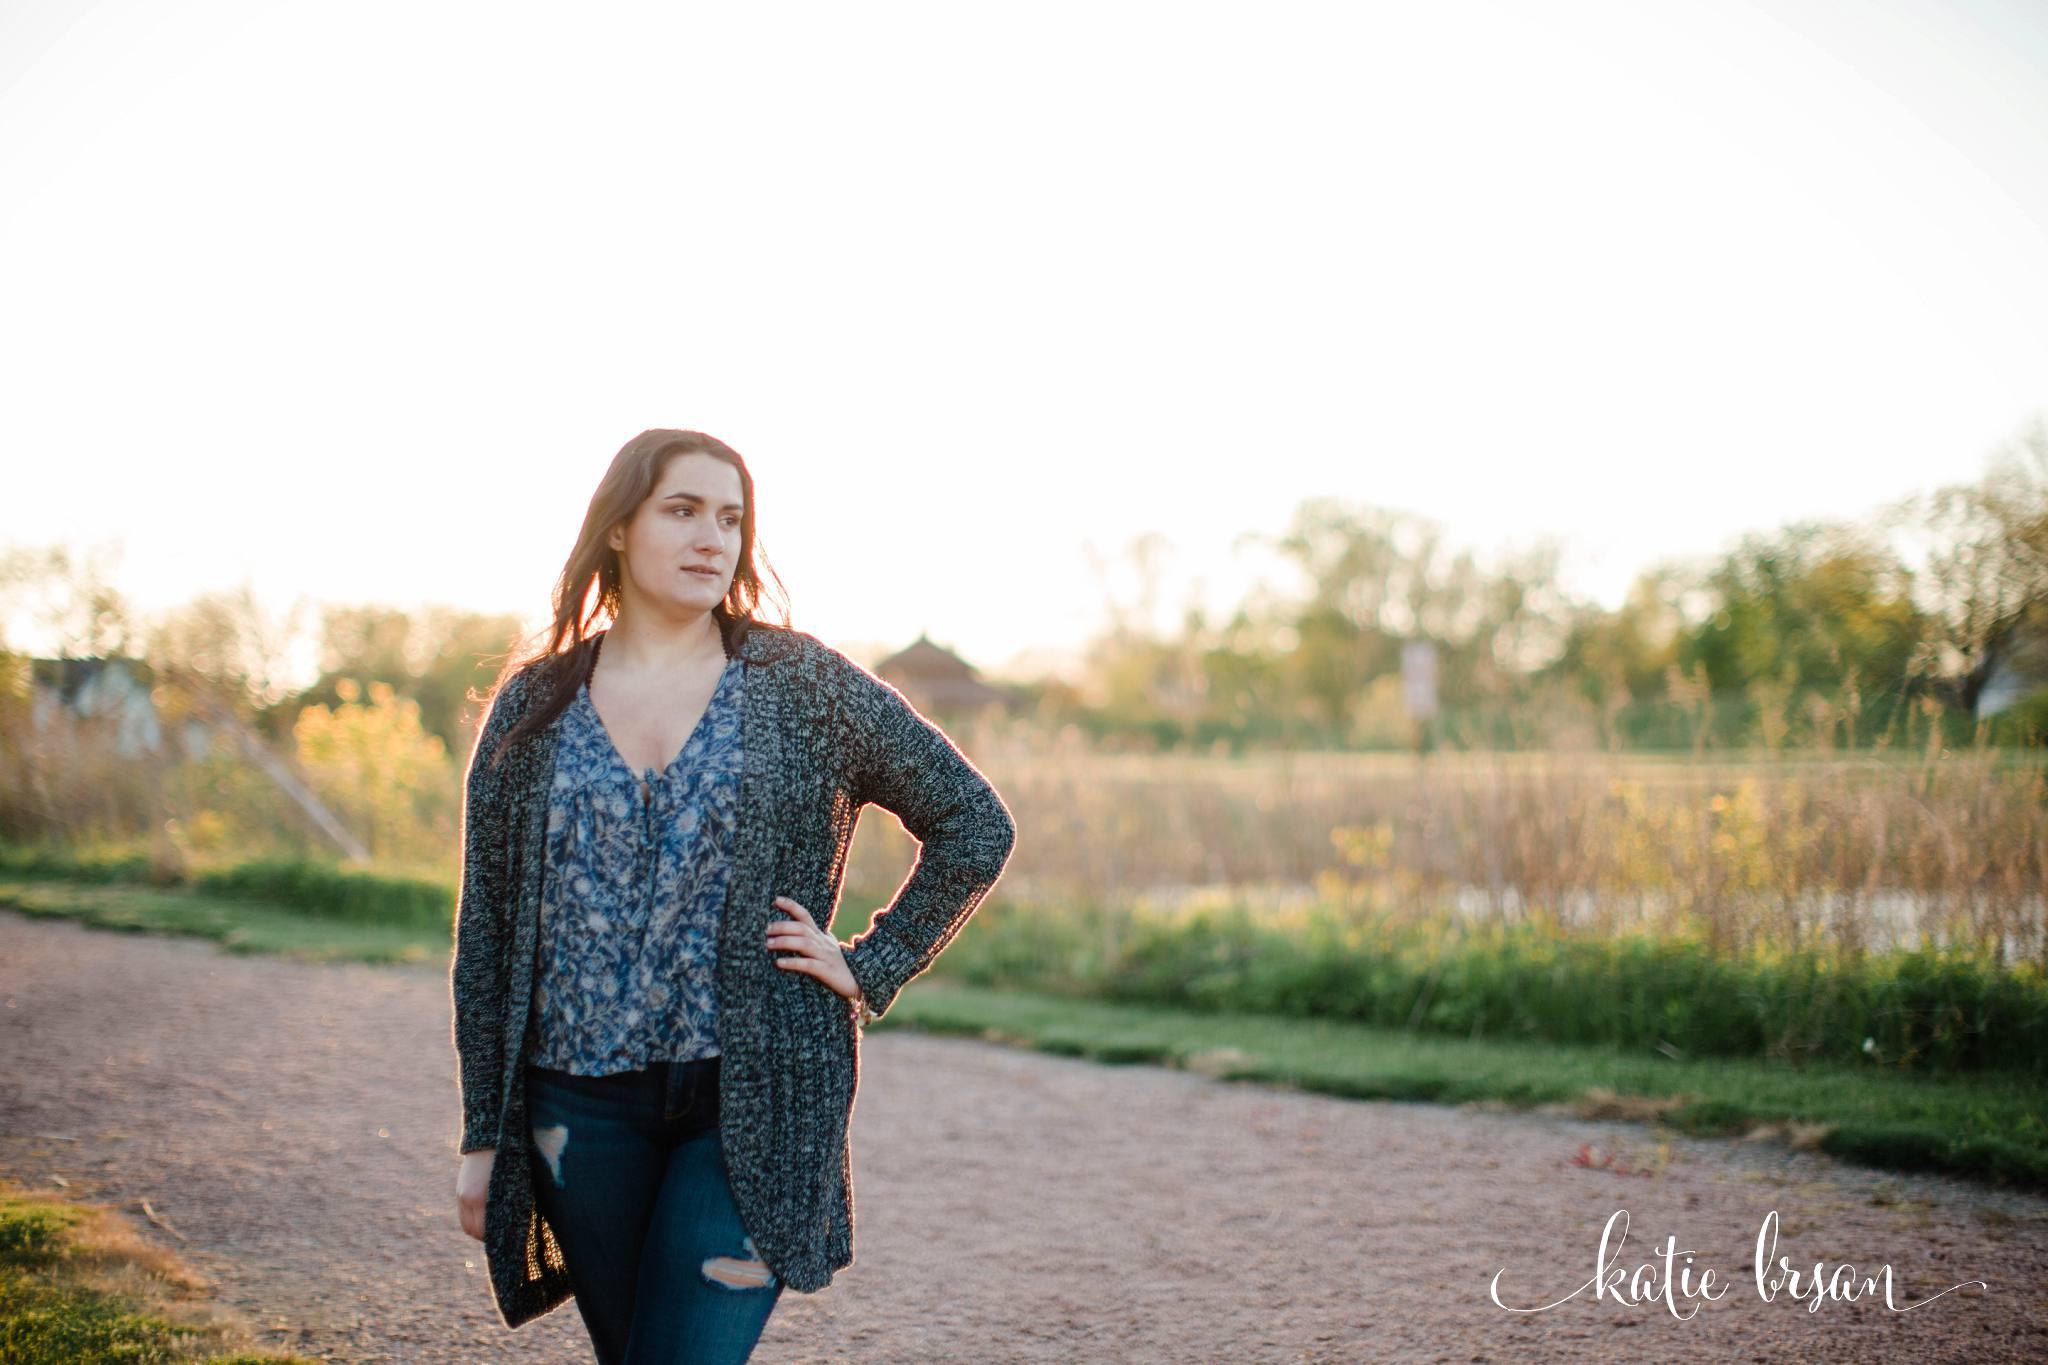 KatieBrsan-Frantfort-seniorphotographer_0546.jpg